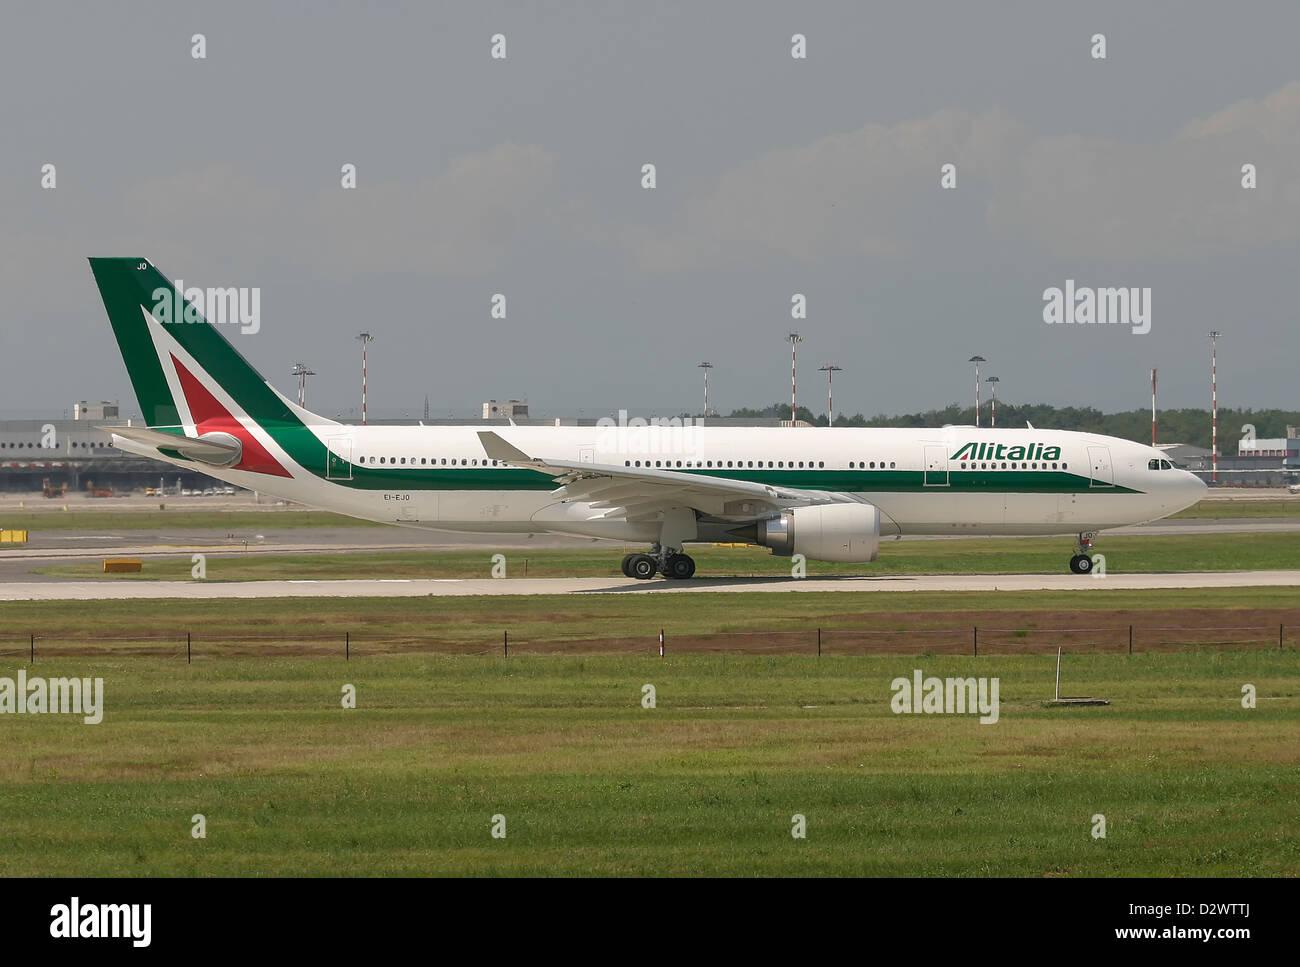 Alitalia, Airbus A330-200 - Stock Image